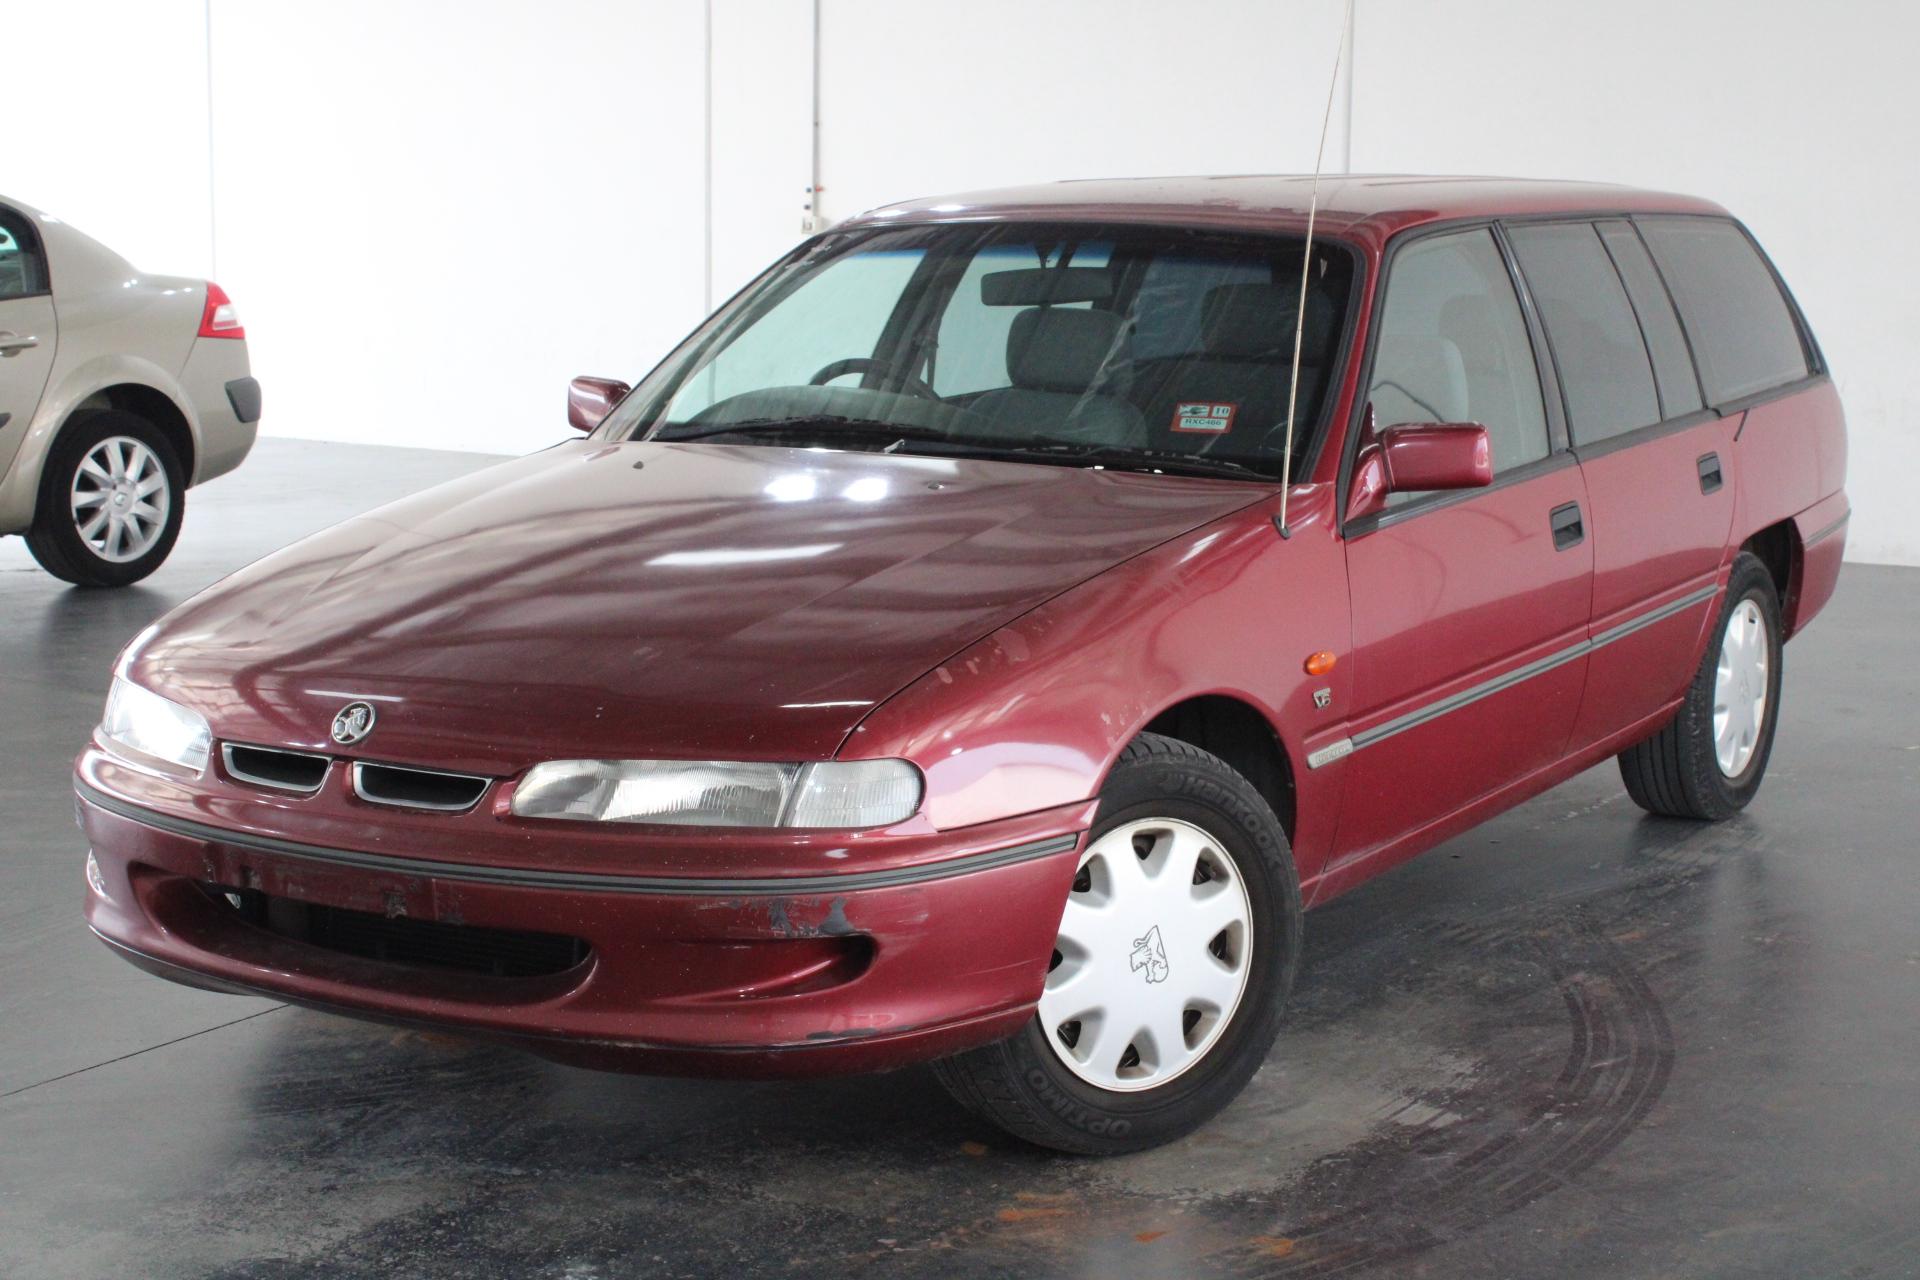 1996 Holden Commodore Acclaim VS Automatic Wagon